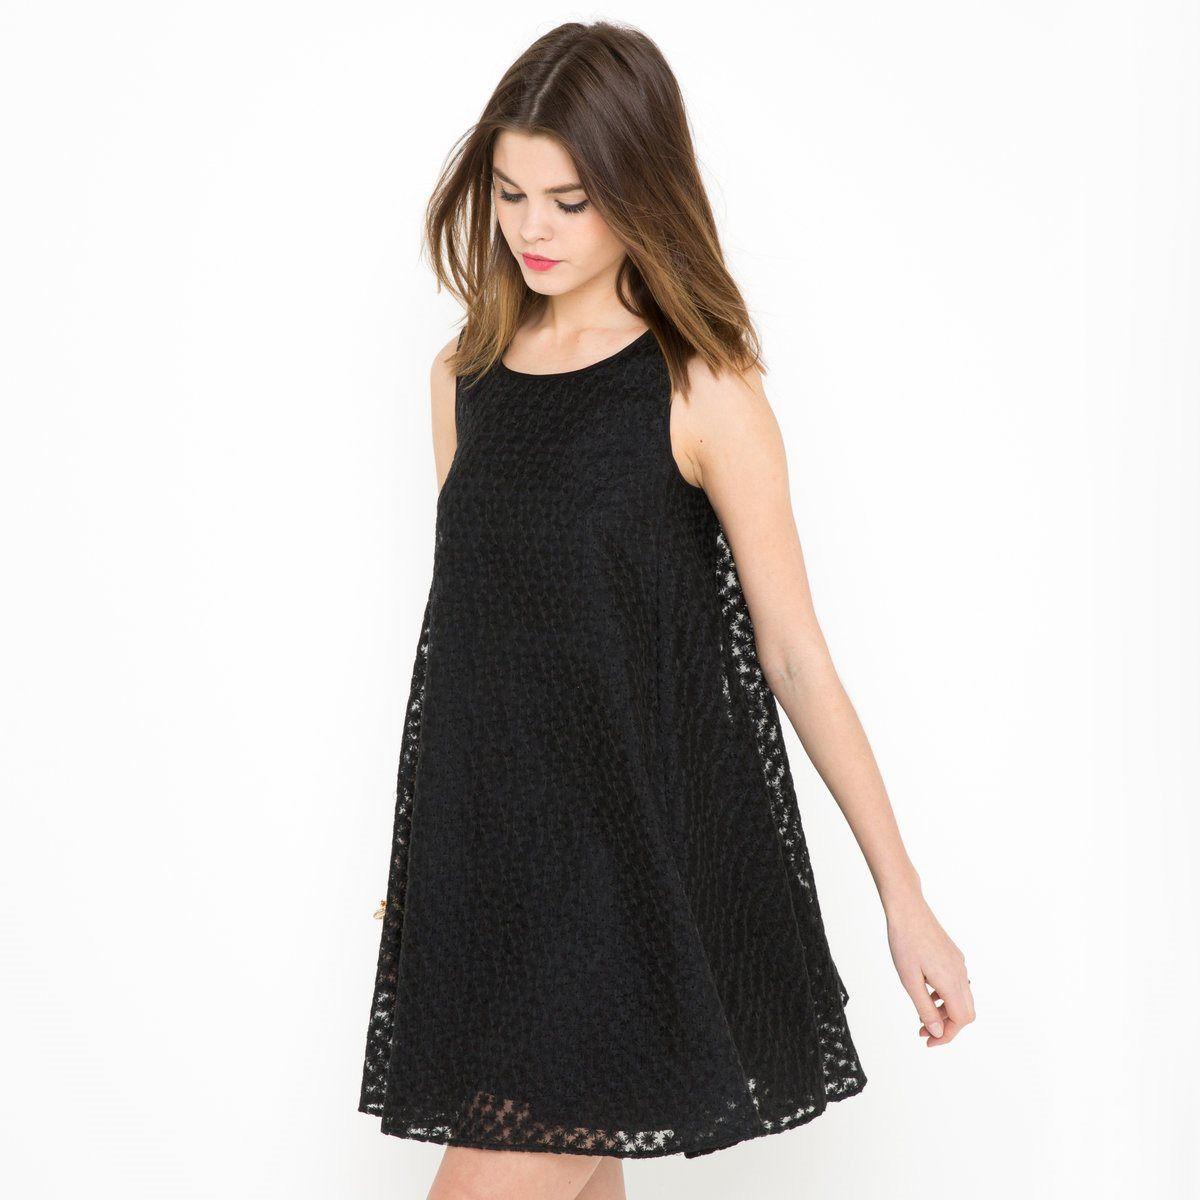 Платье из вышитой органзы Mademoiselle R | La Redoute